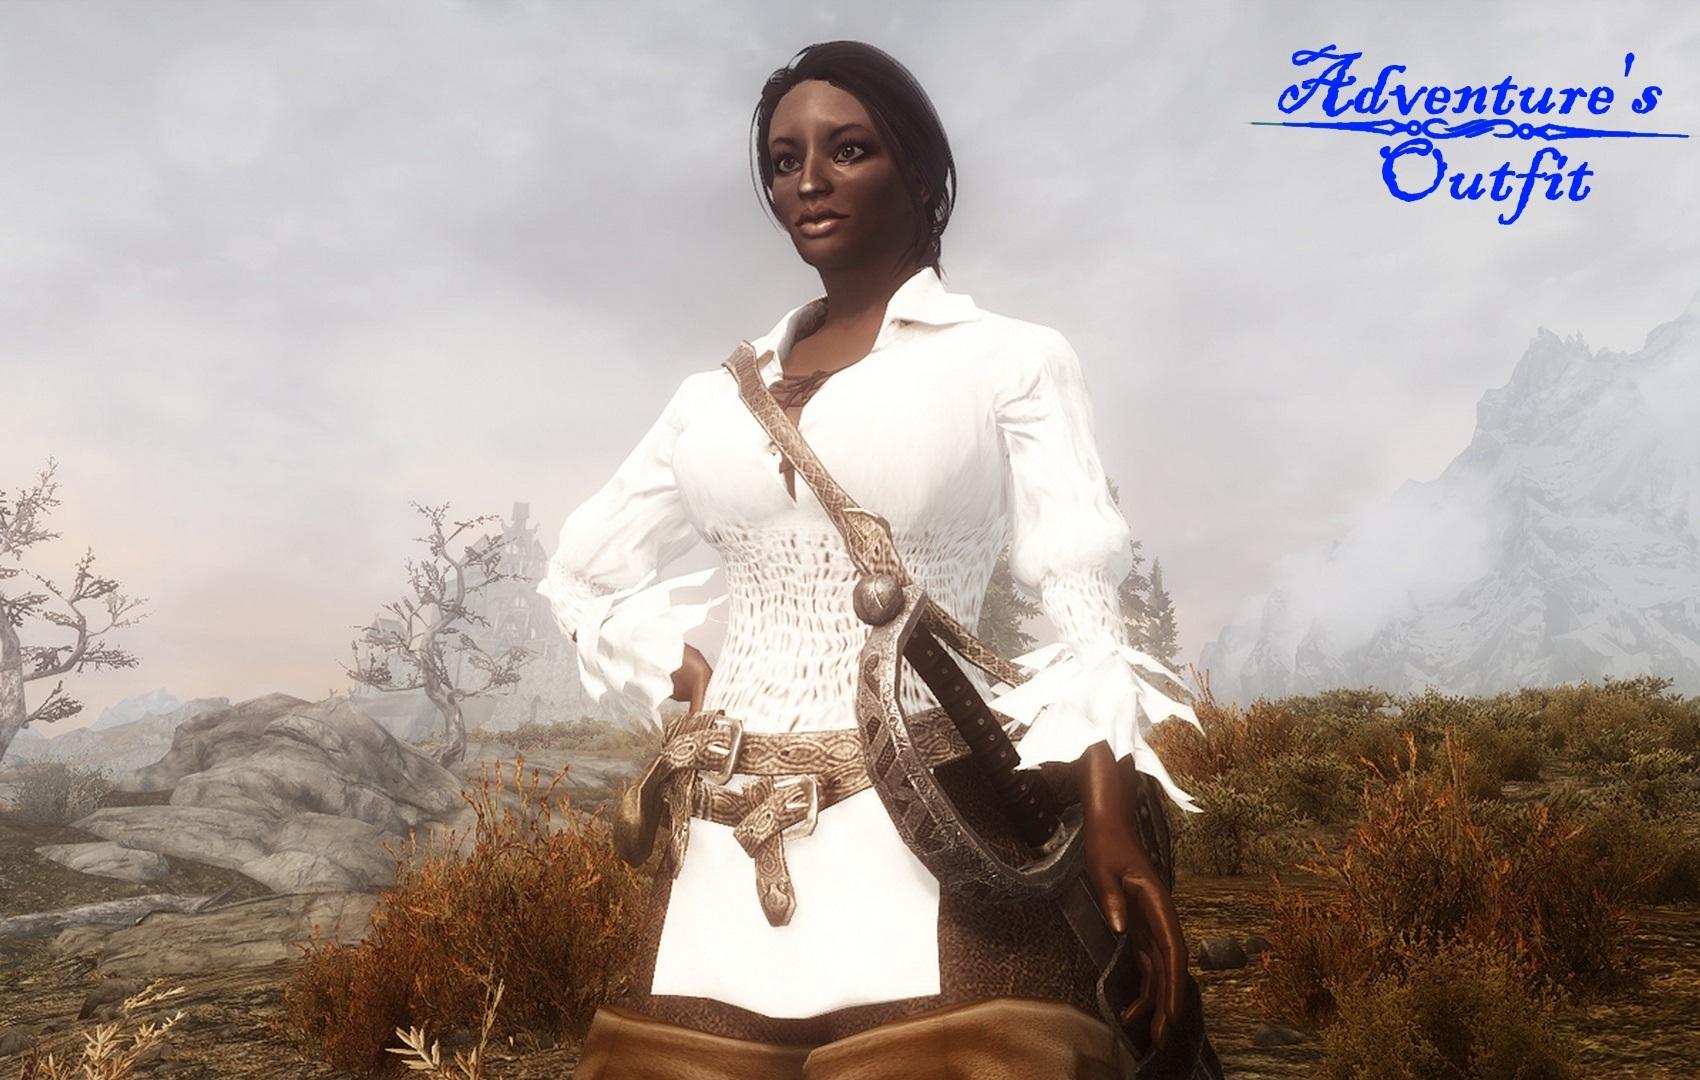 Adventurer's_Outfit_00.jpg